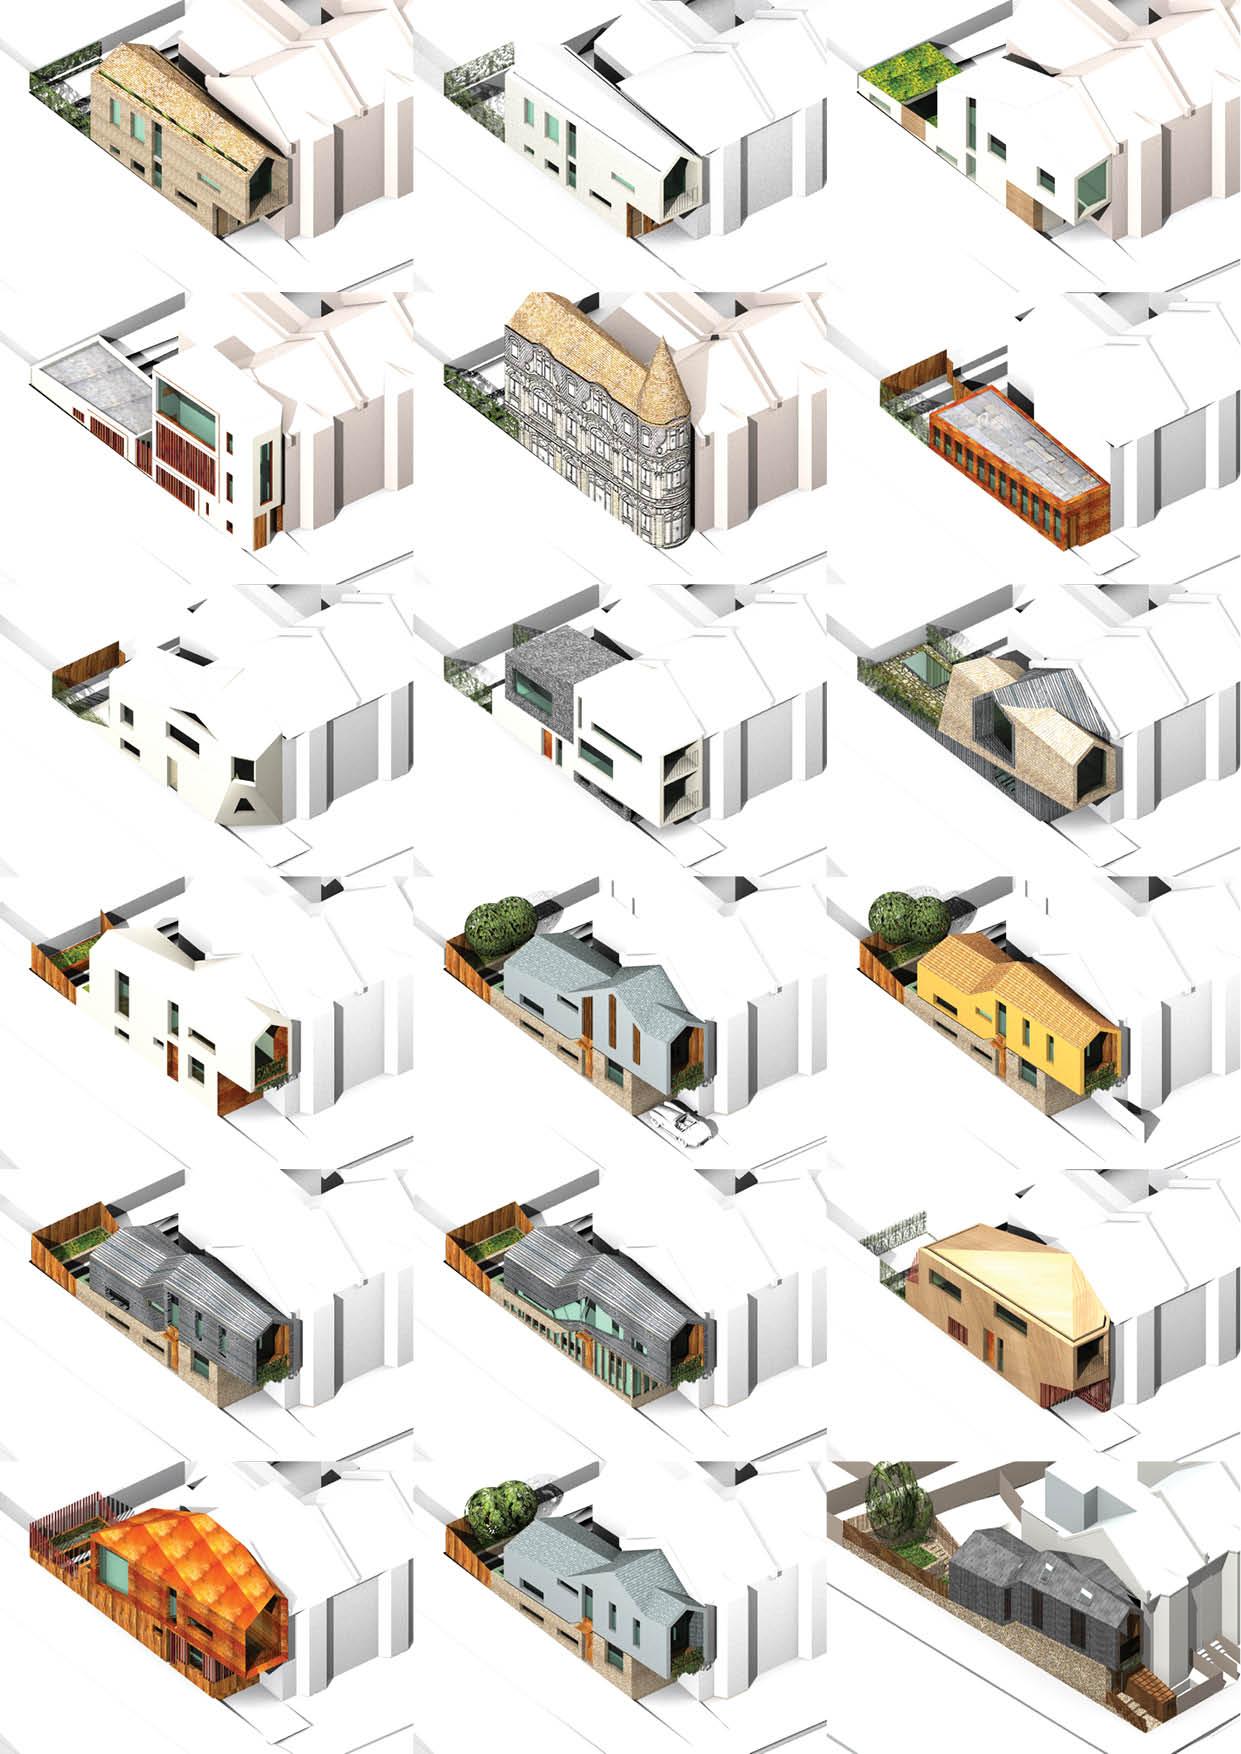 House design options